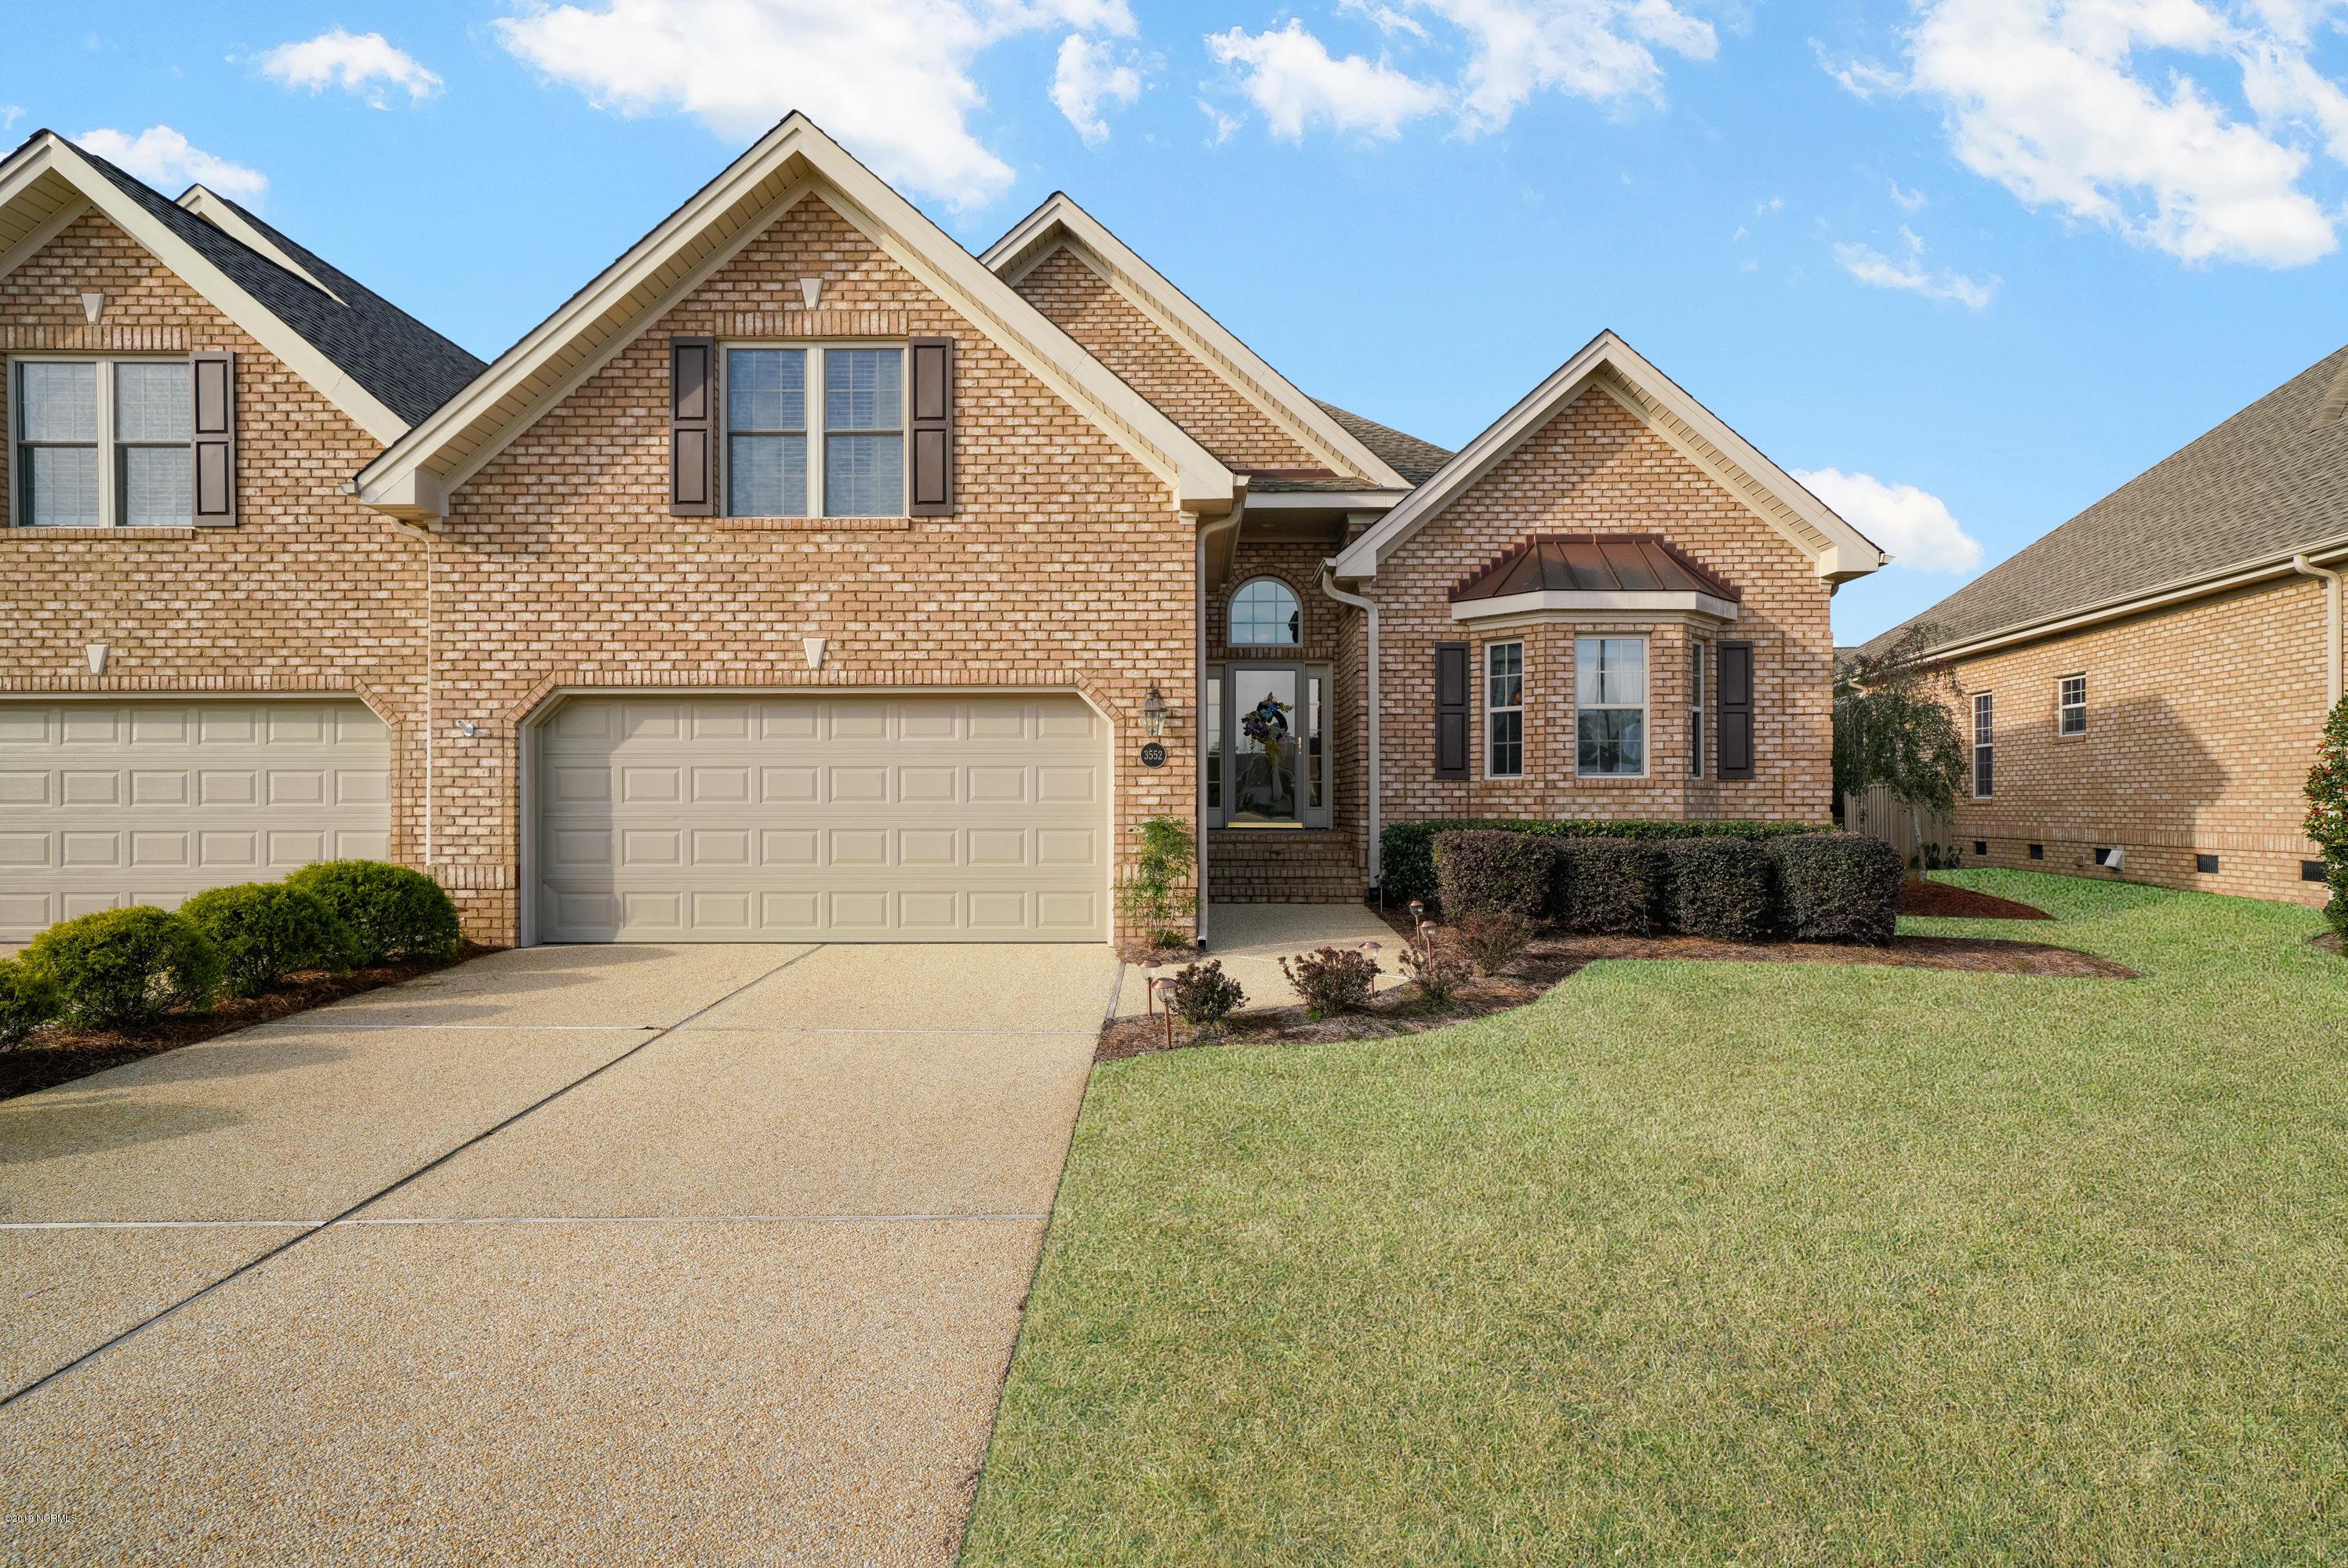 Carolina Plantations Real Estate - MLS Number: 100146225